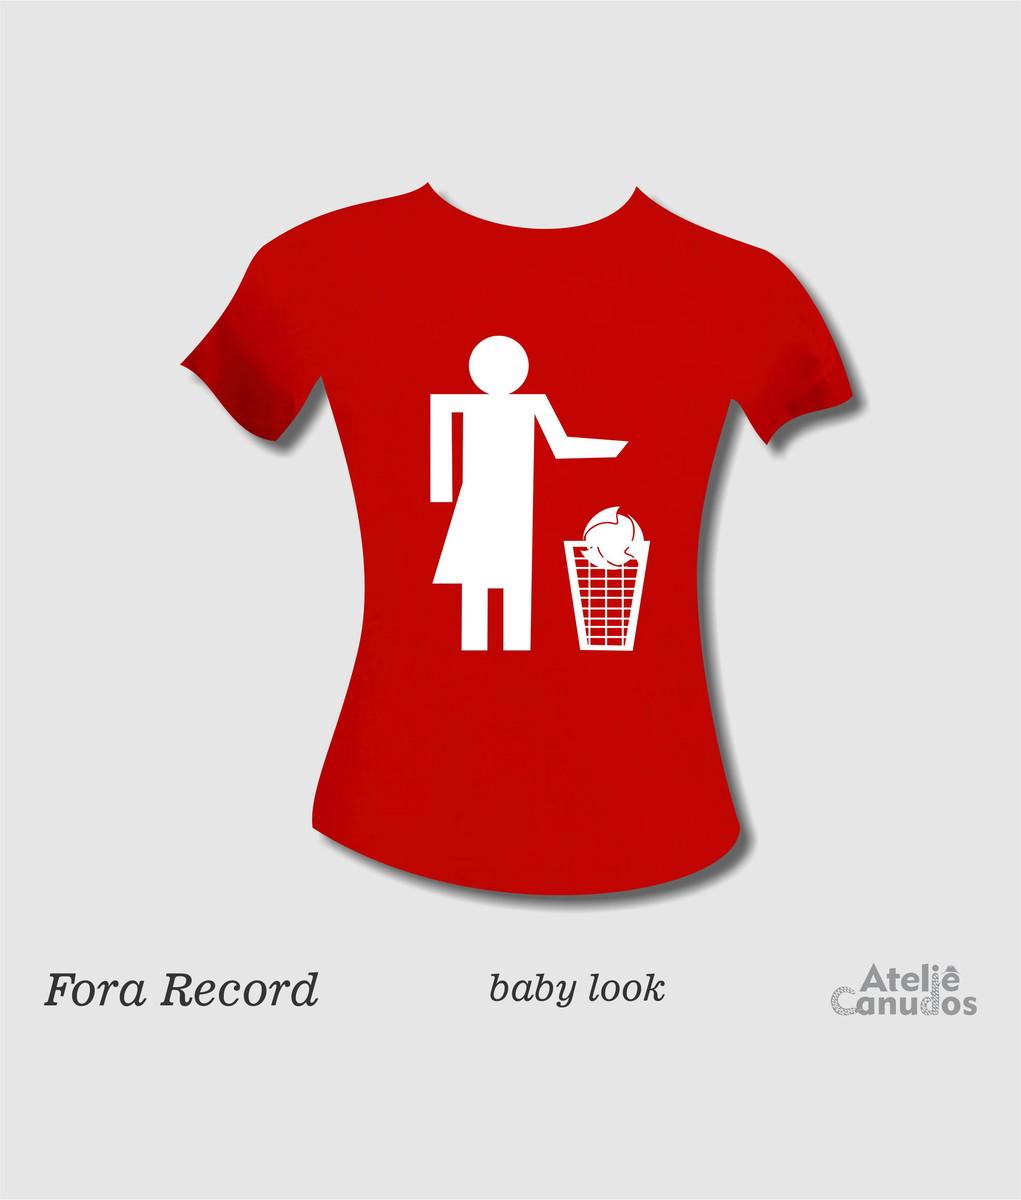 Camisa Fora Record - vermelha estampa branca no Elo7  6afefebe9775c